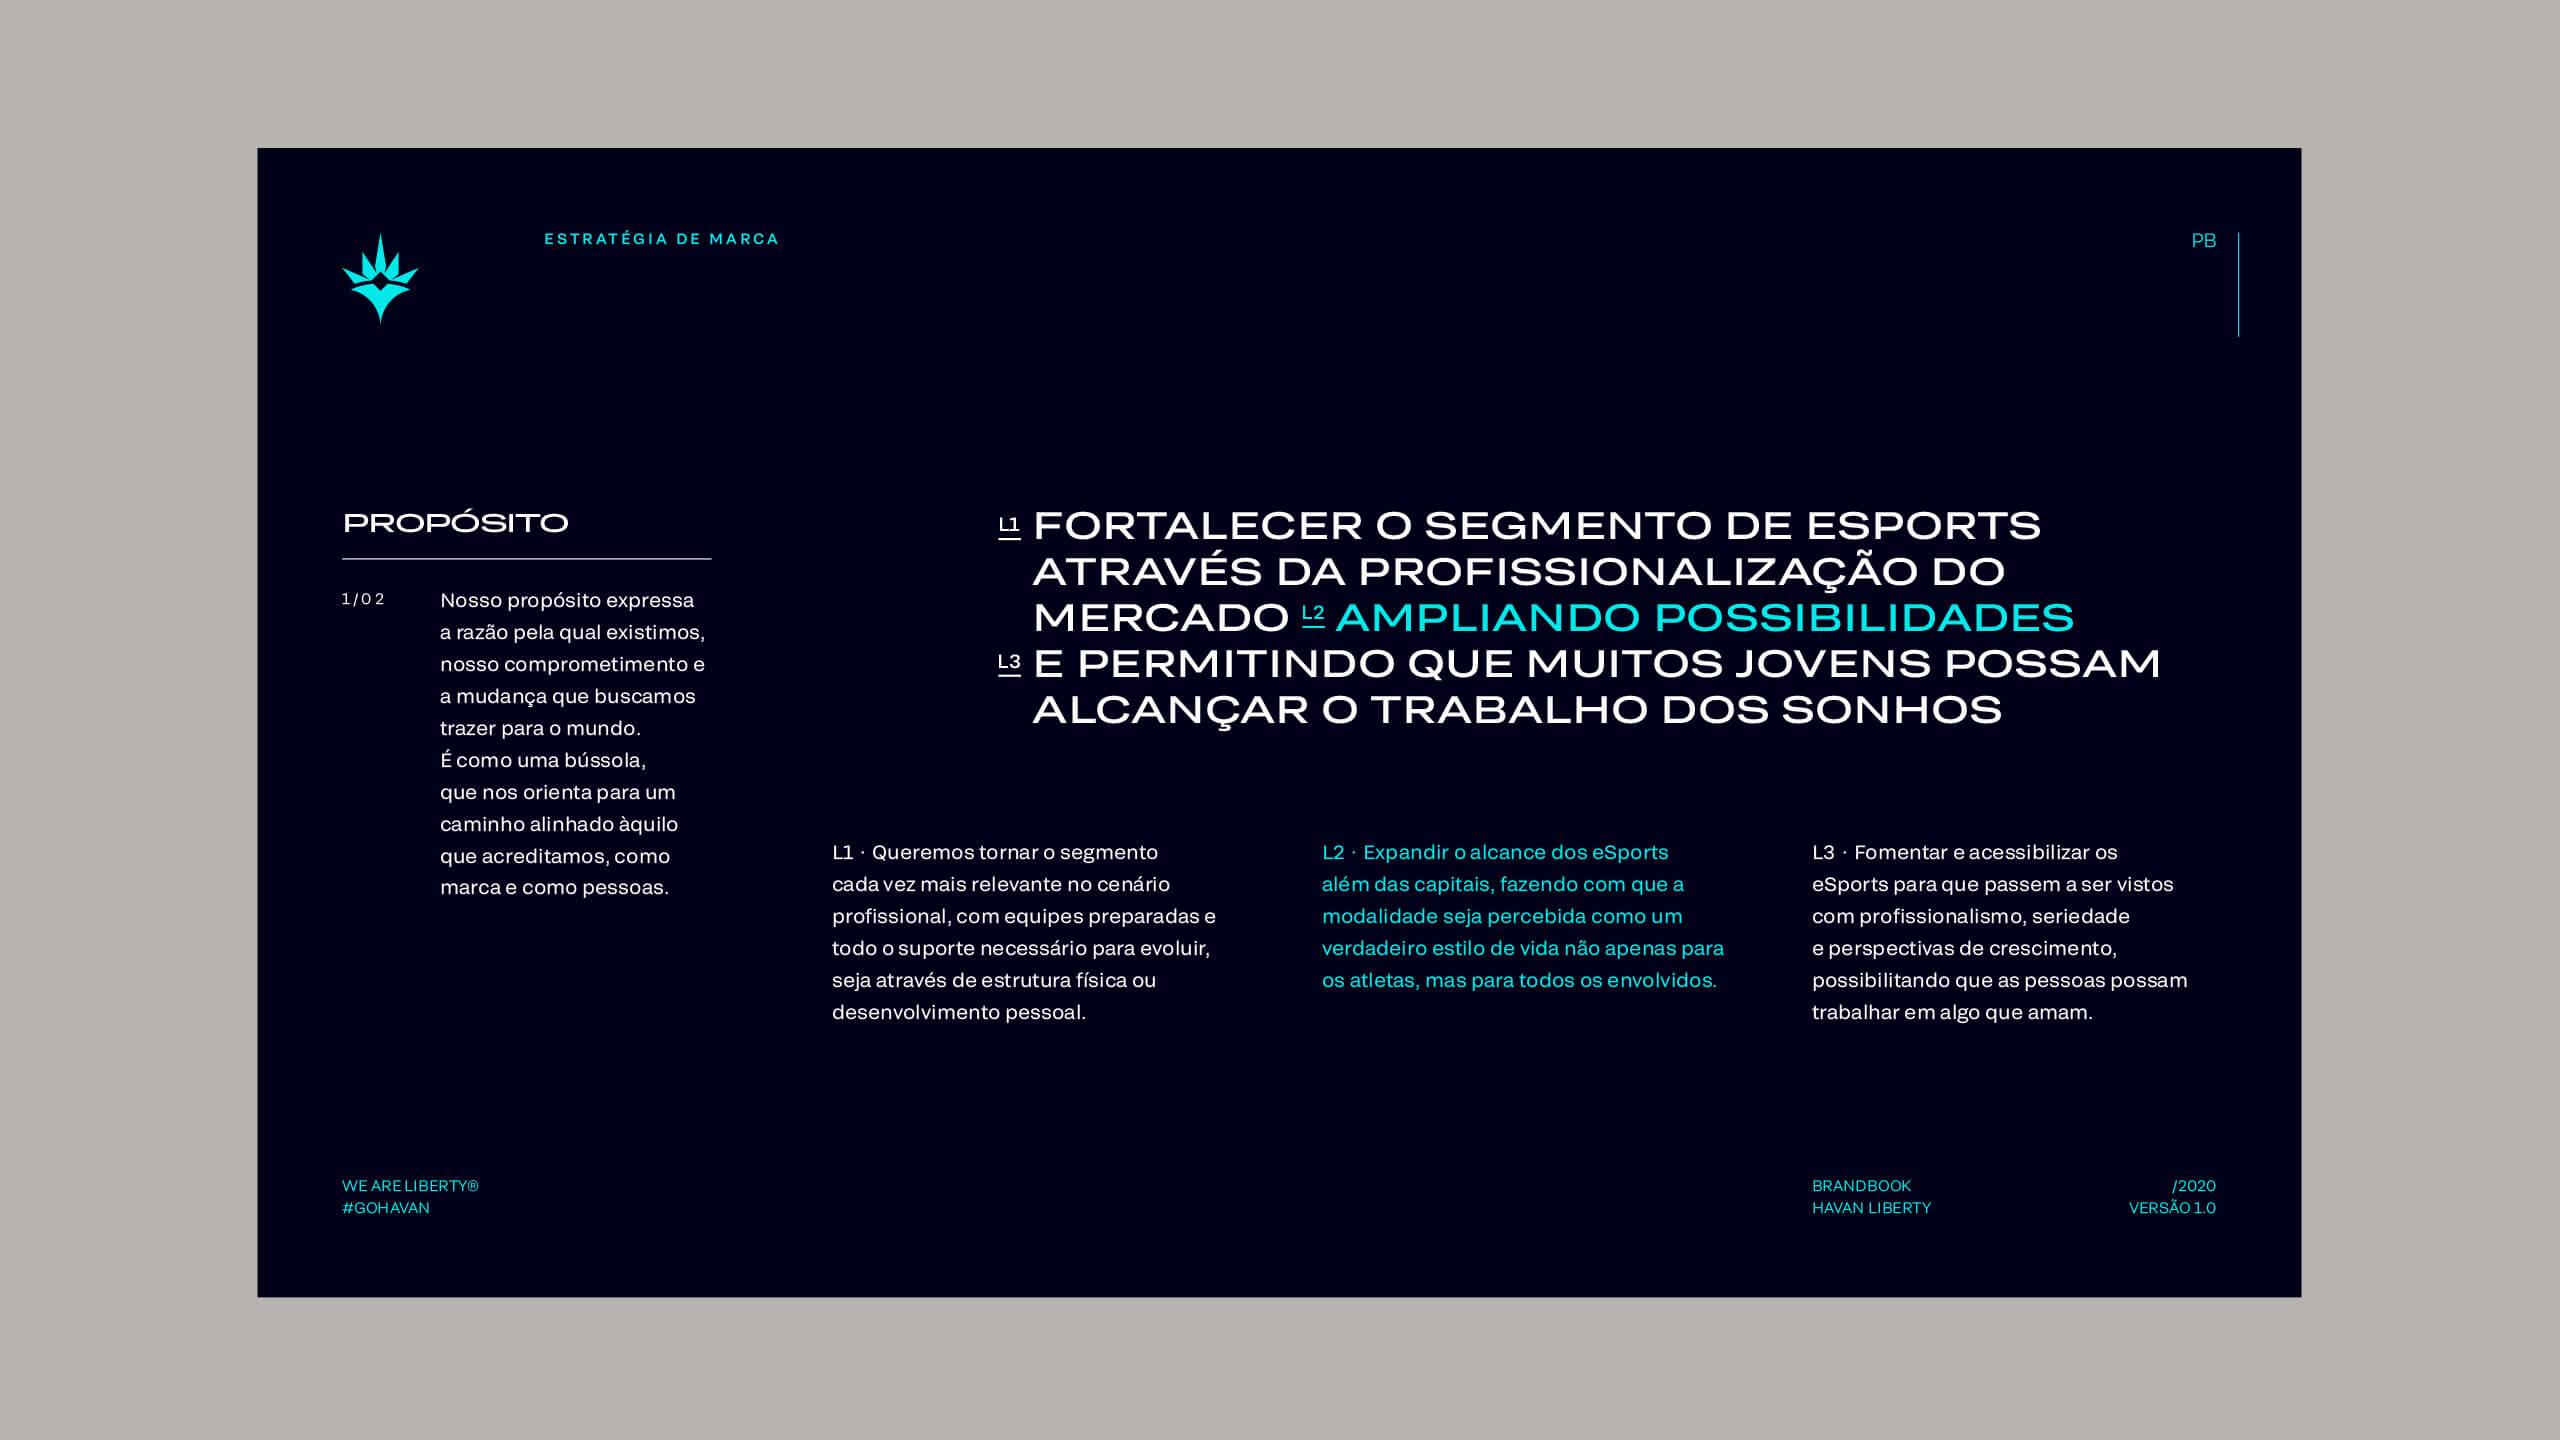 firmorama_havan-liberty_05-1